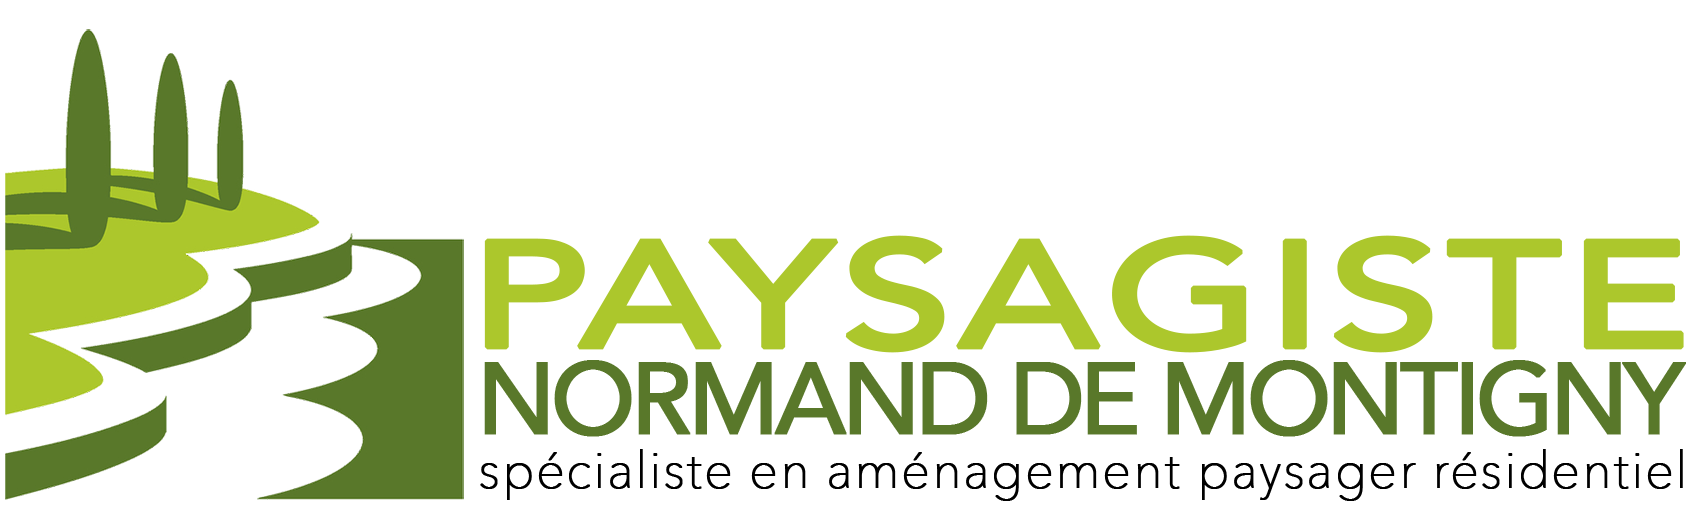 logo-final-2020_normand-de-montigny-paysagiste